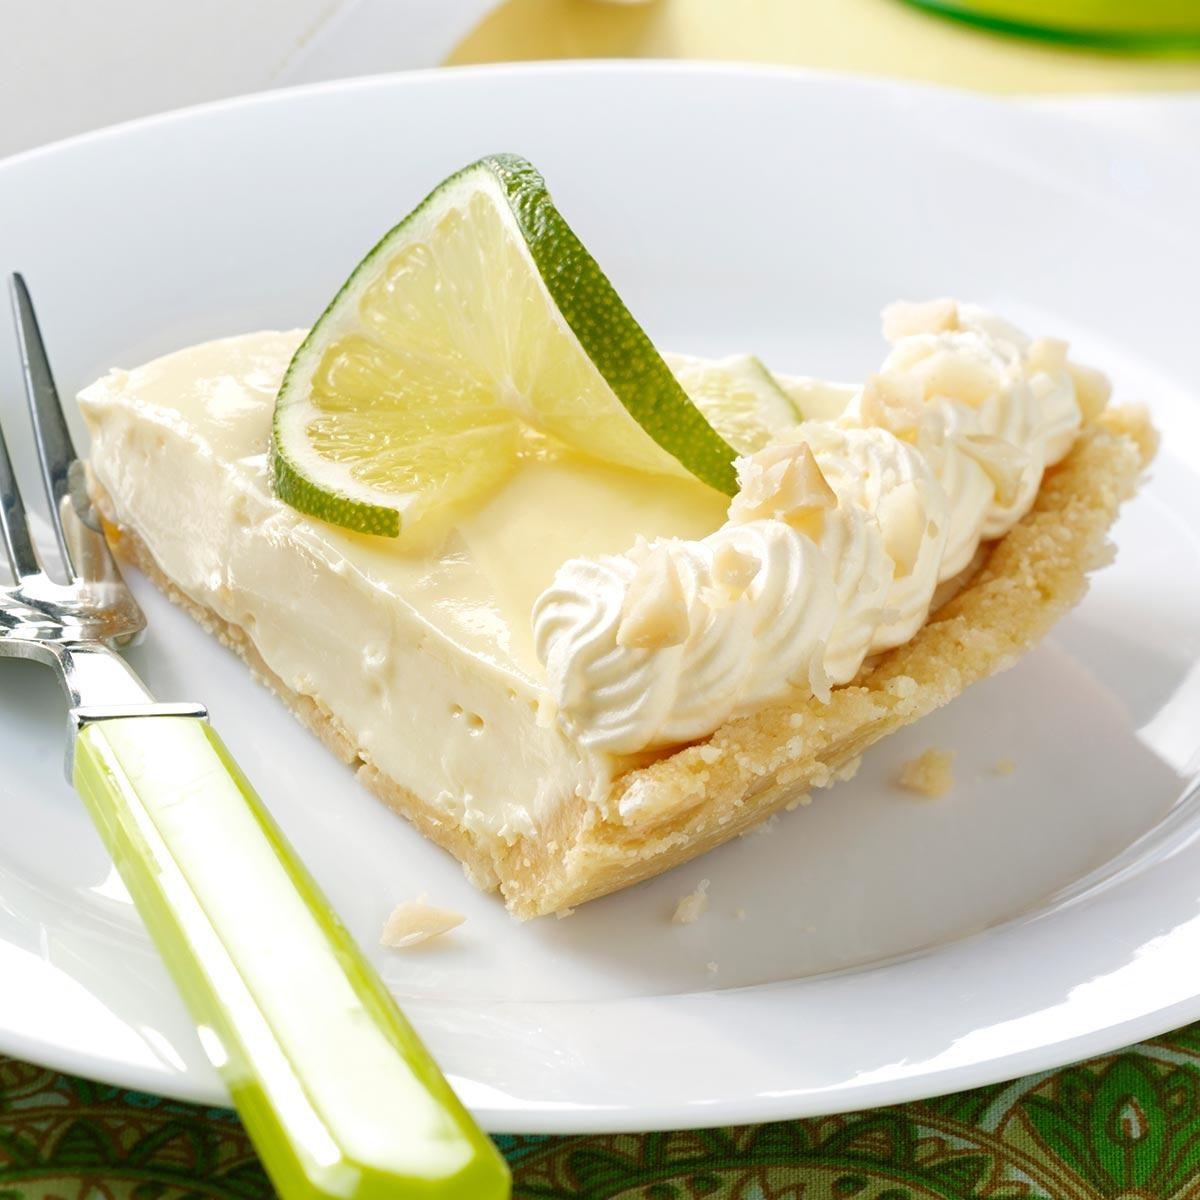 Macadamia Key Lime Pie Recipe | Taste of Home